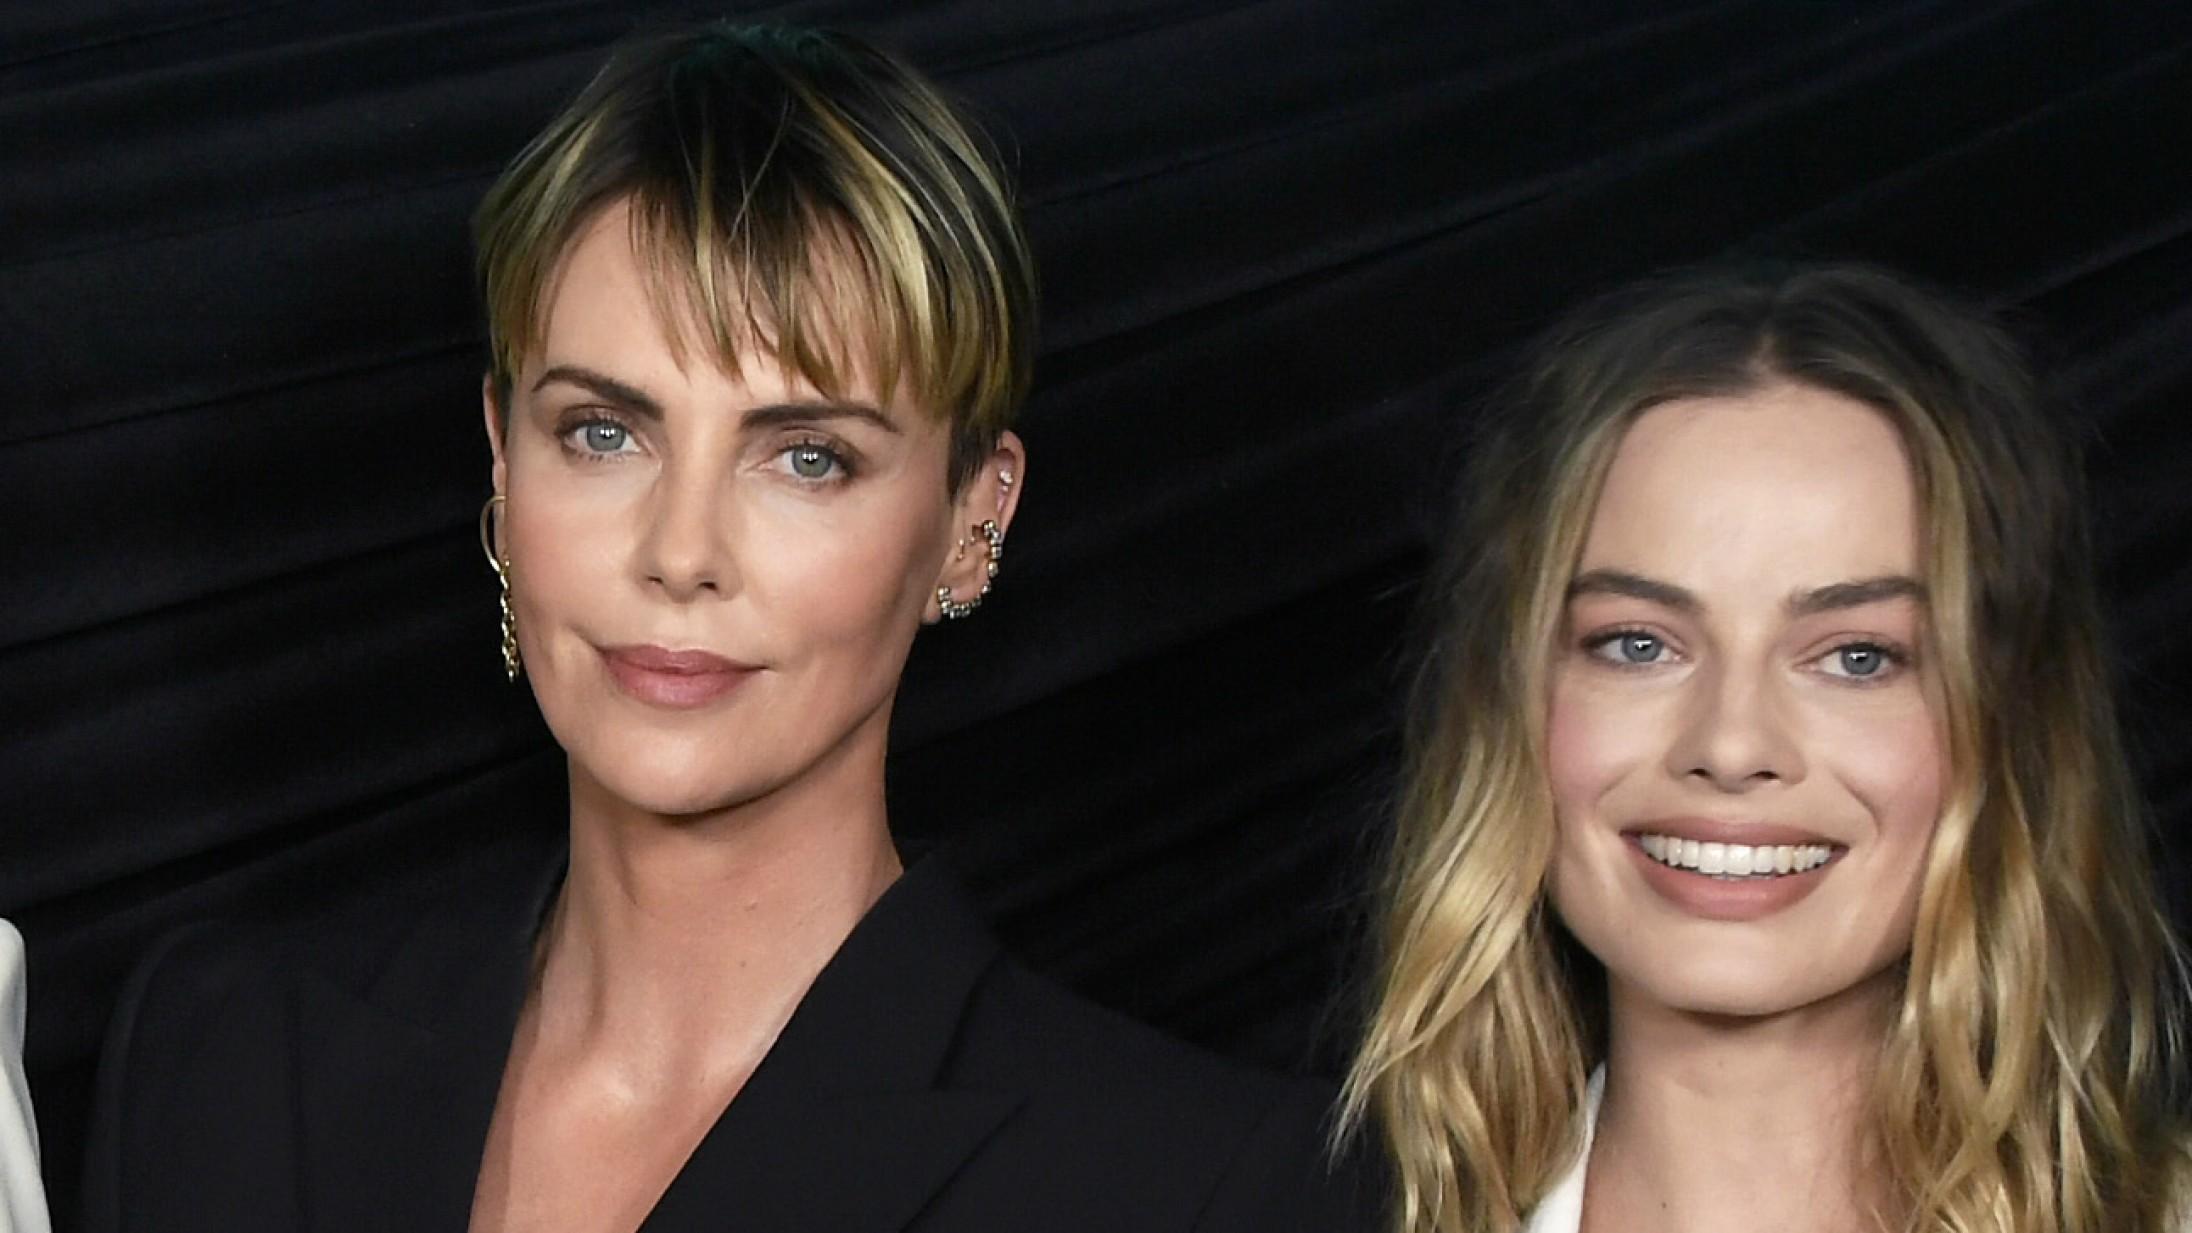 Hvad Charlize Theron og Margot Robbie lærte om seksuelle overgreb gennem 'Bombshell'